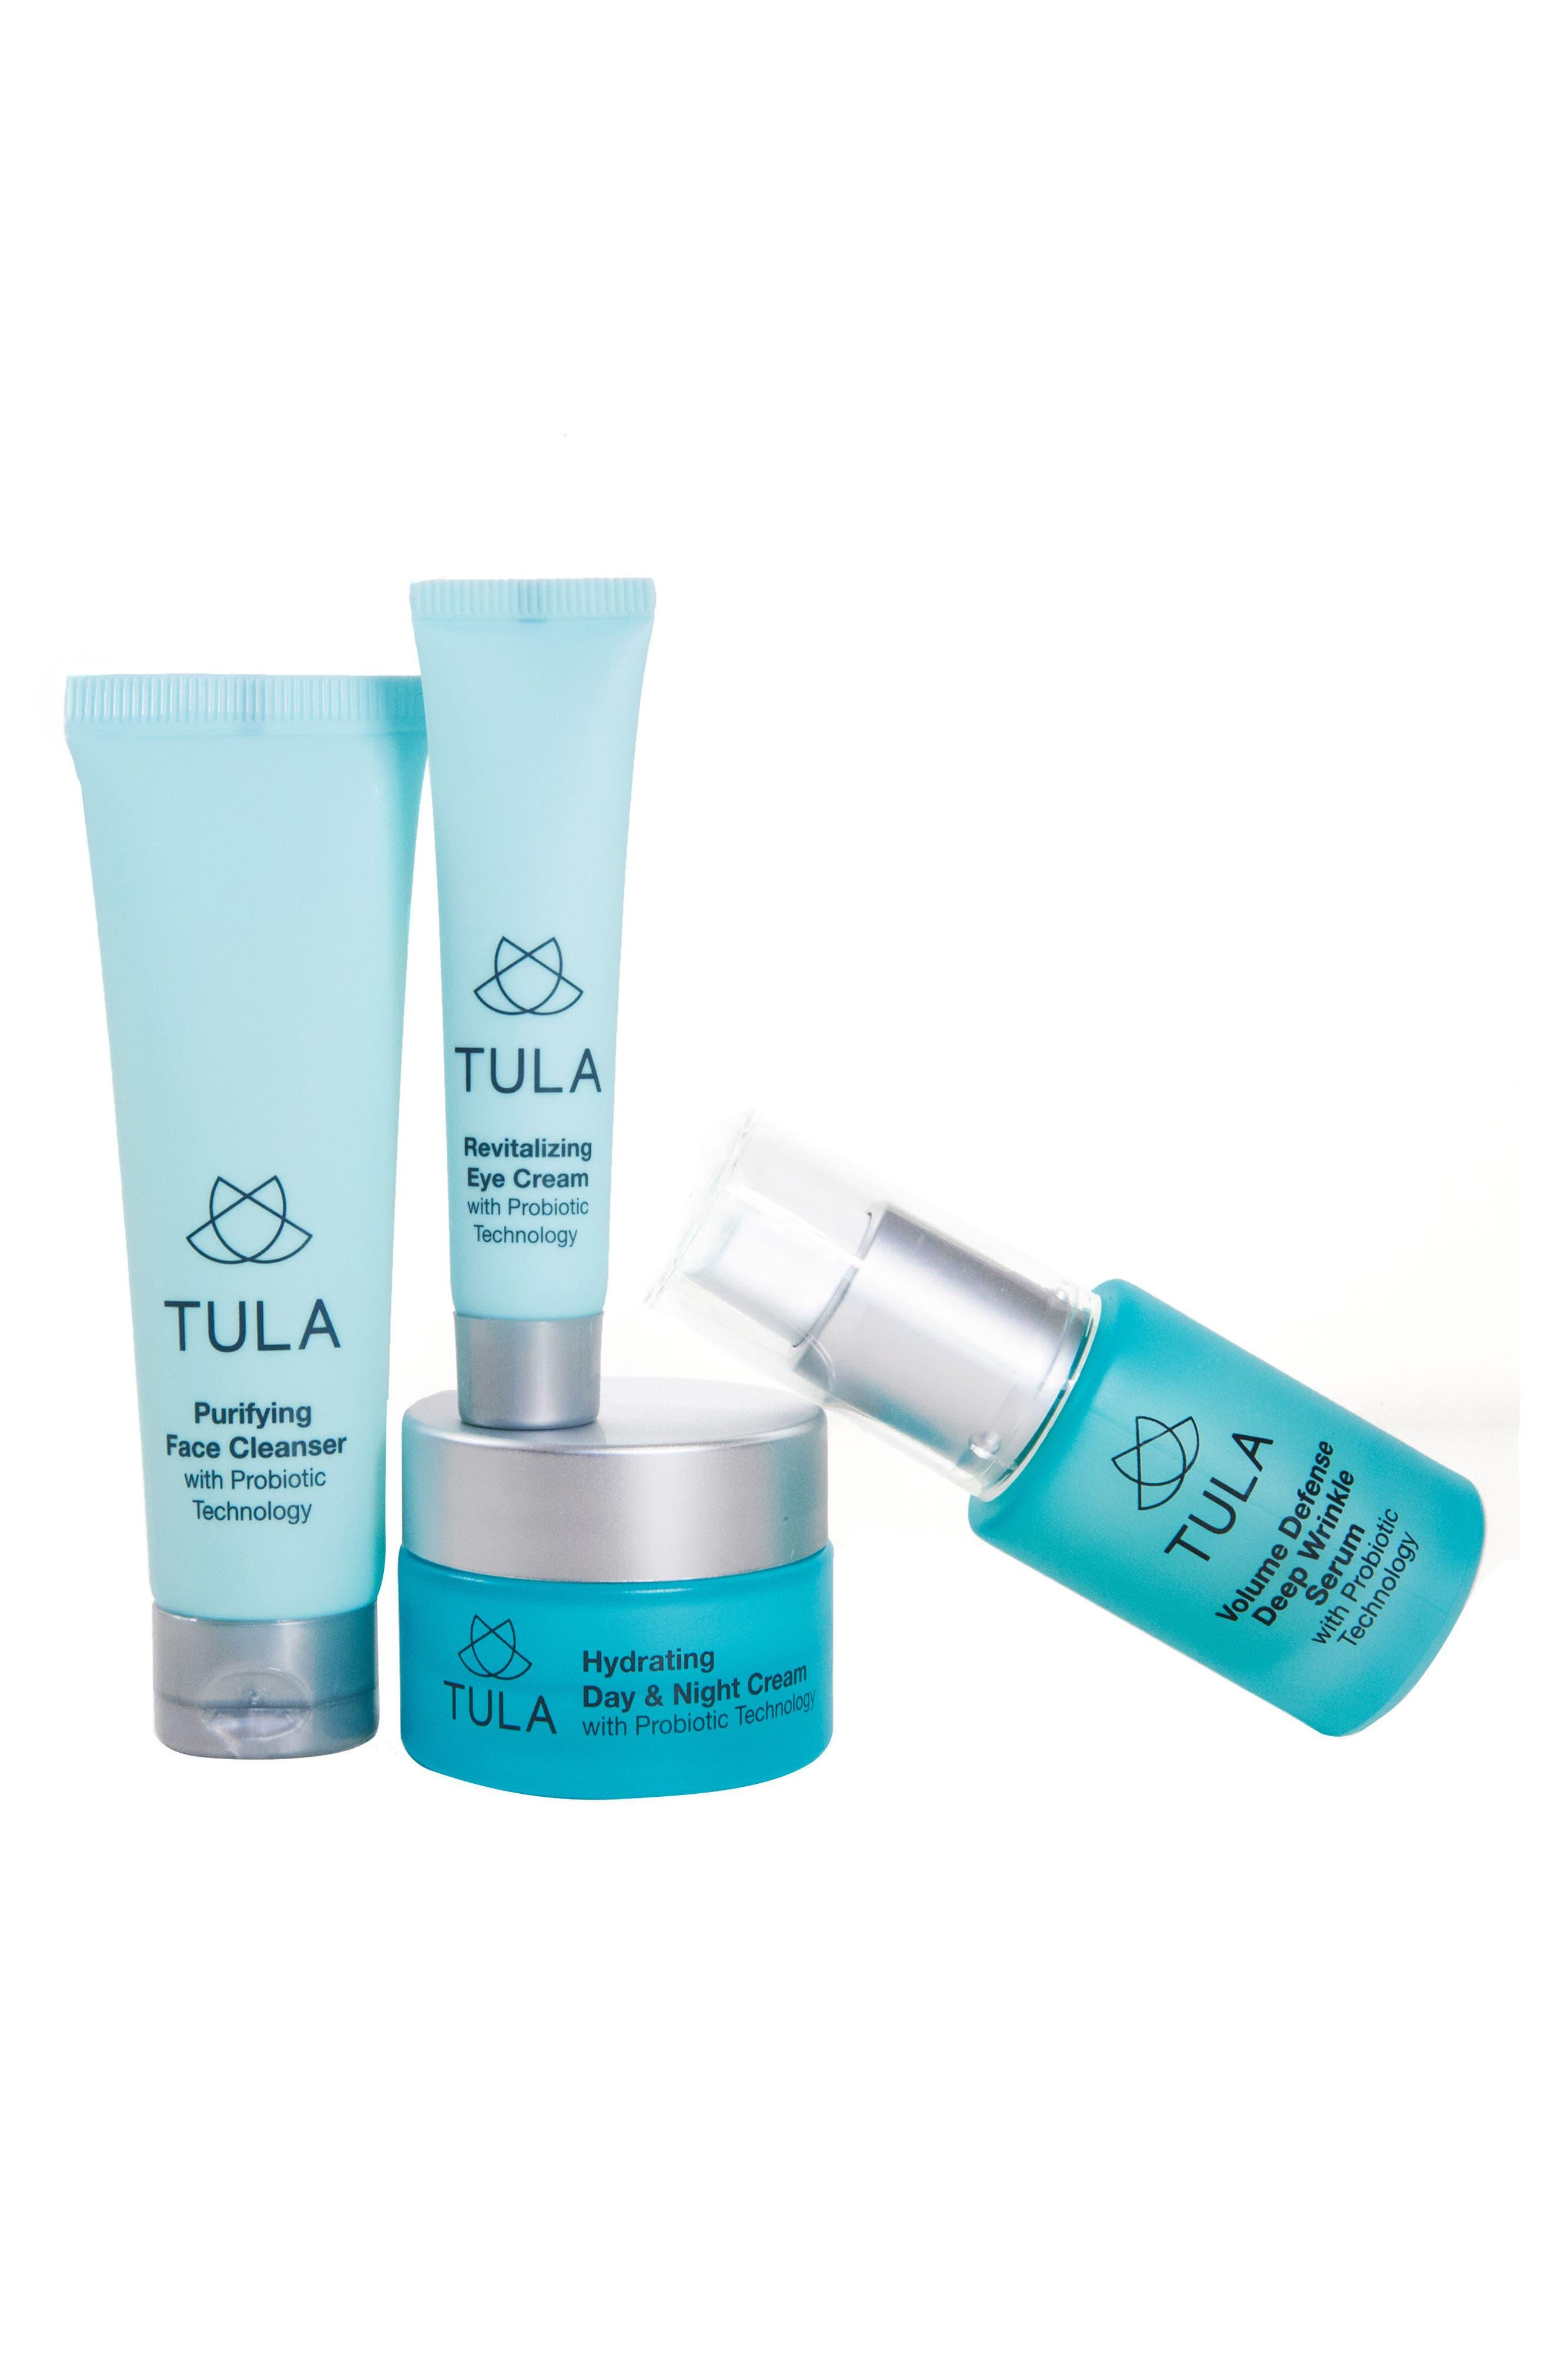 Tula Probiotic Skincare Anti-Aging Discovery Kit ($126 Value)